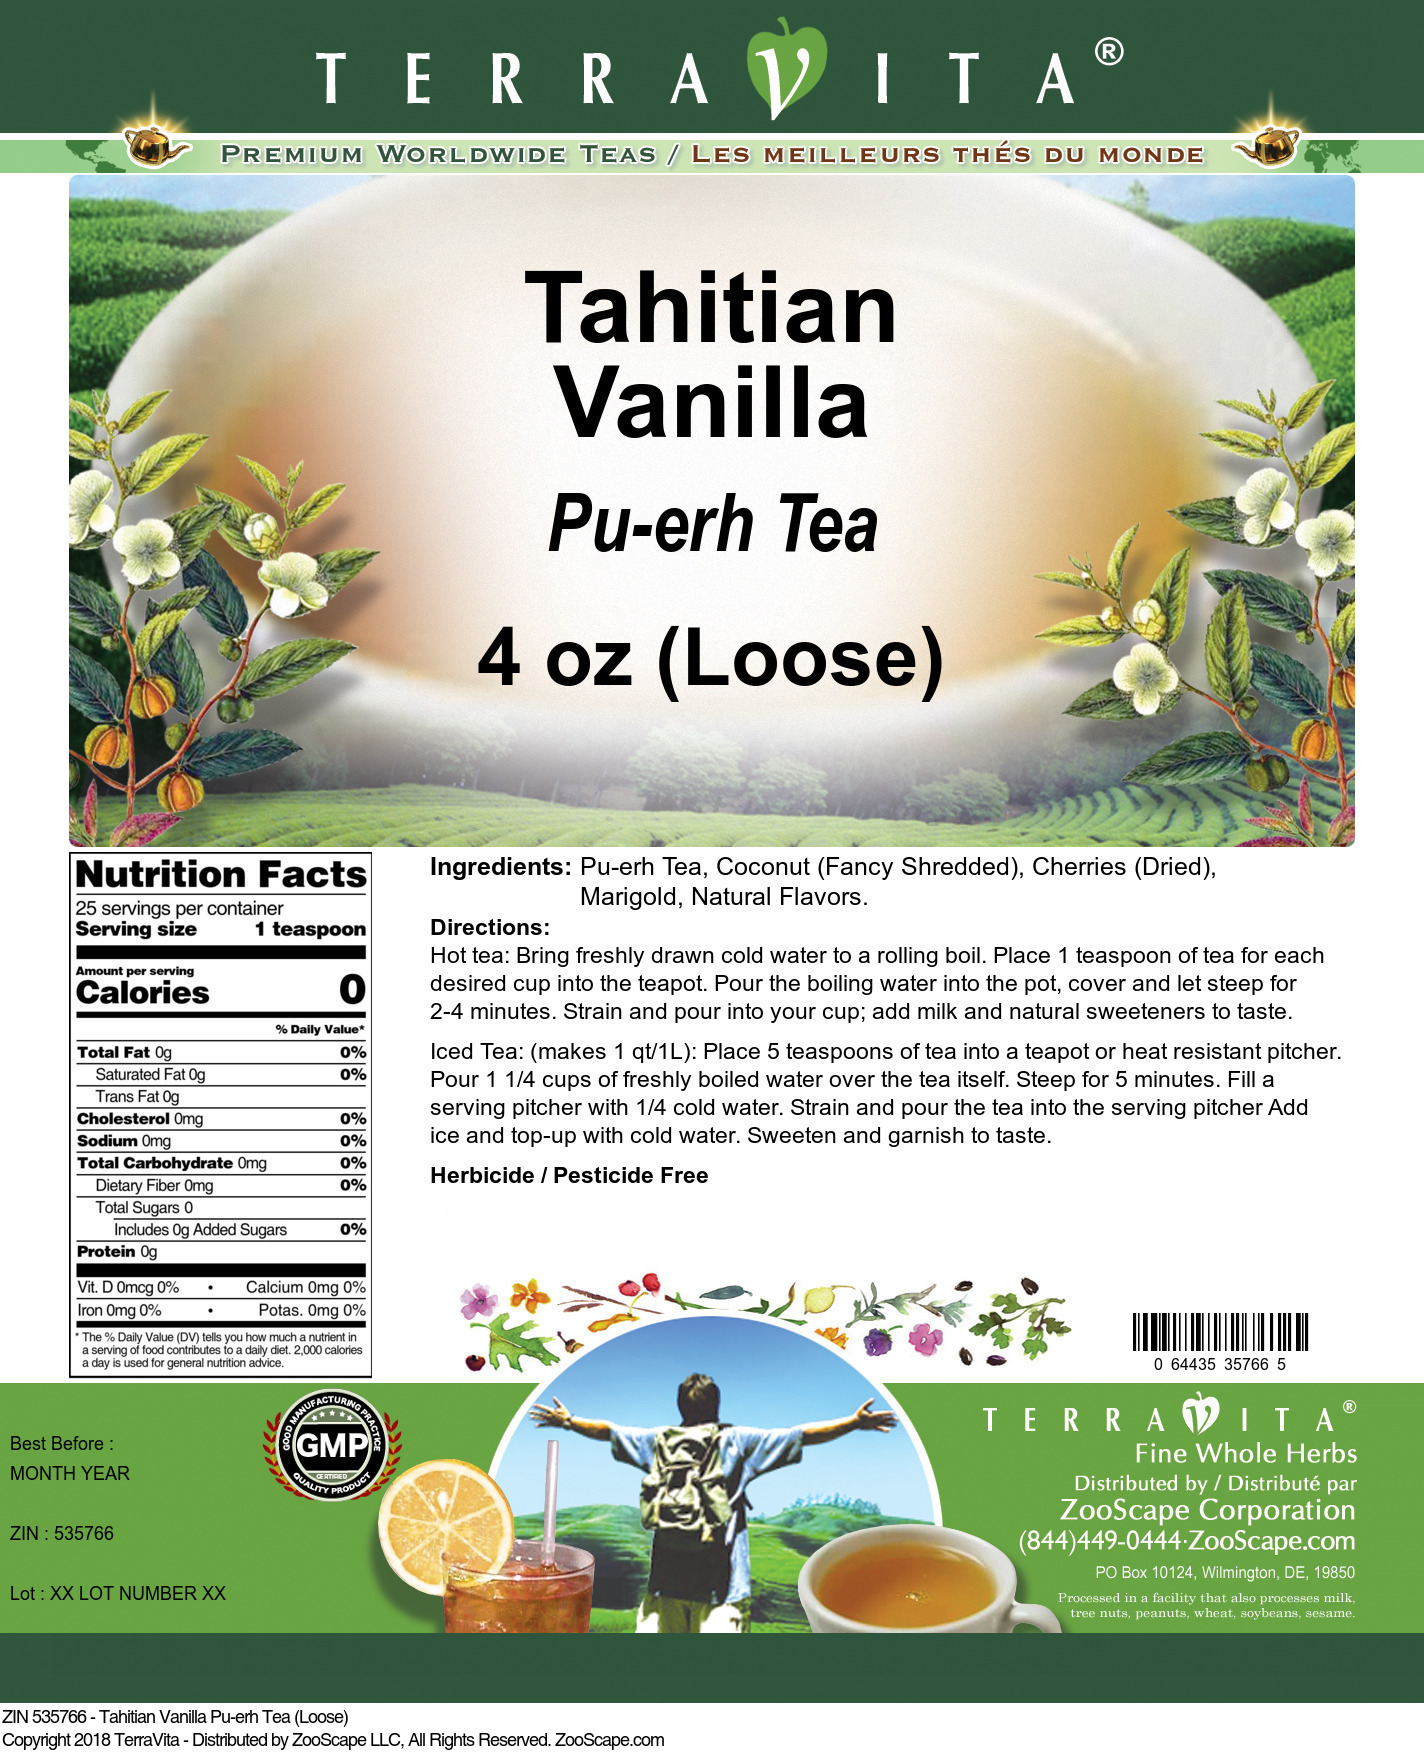 Tahitian Vanilla Pu-erh Tea (Loose)